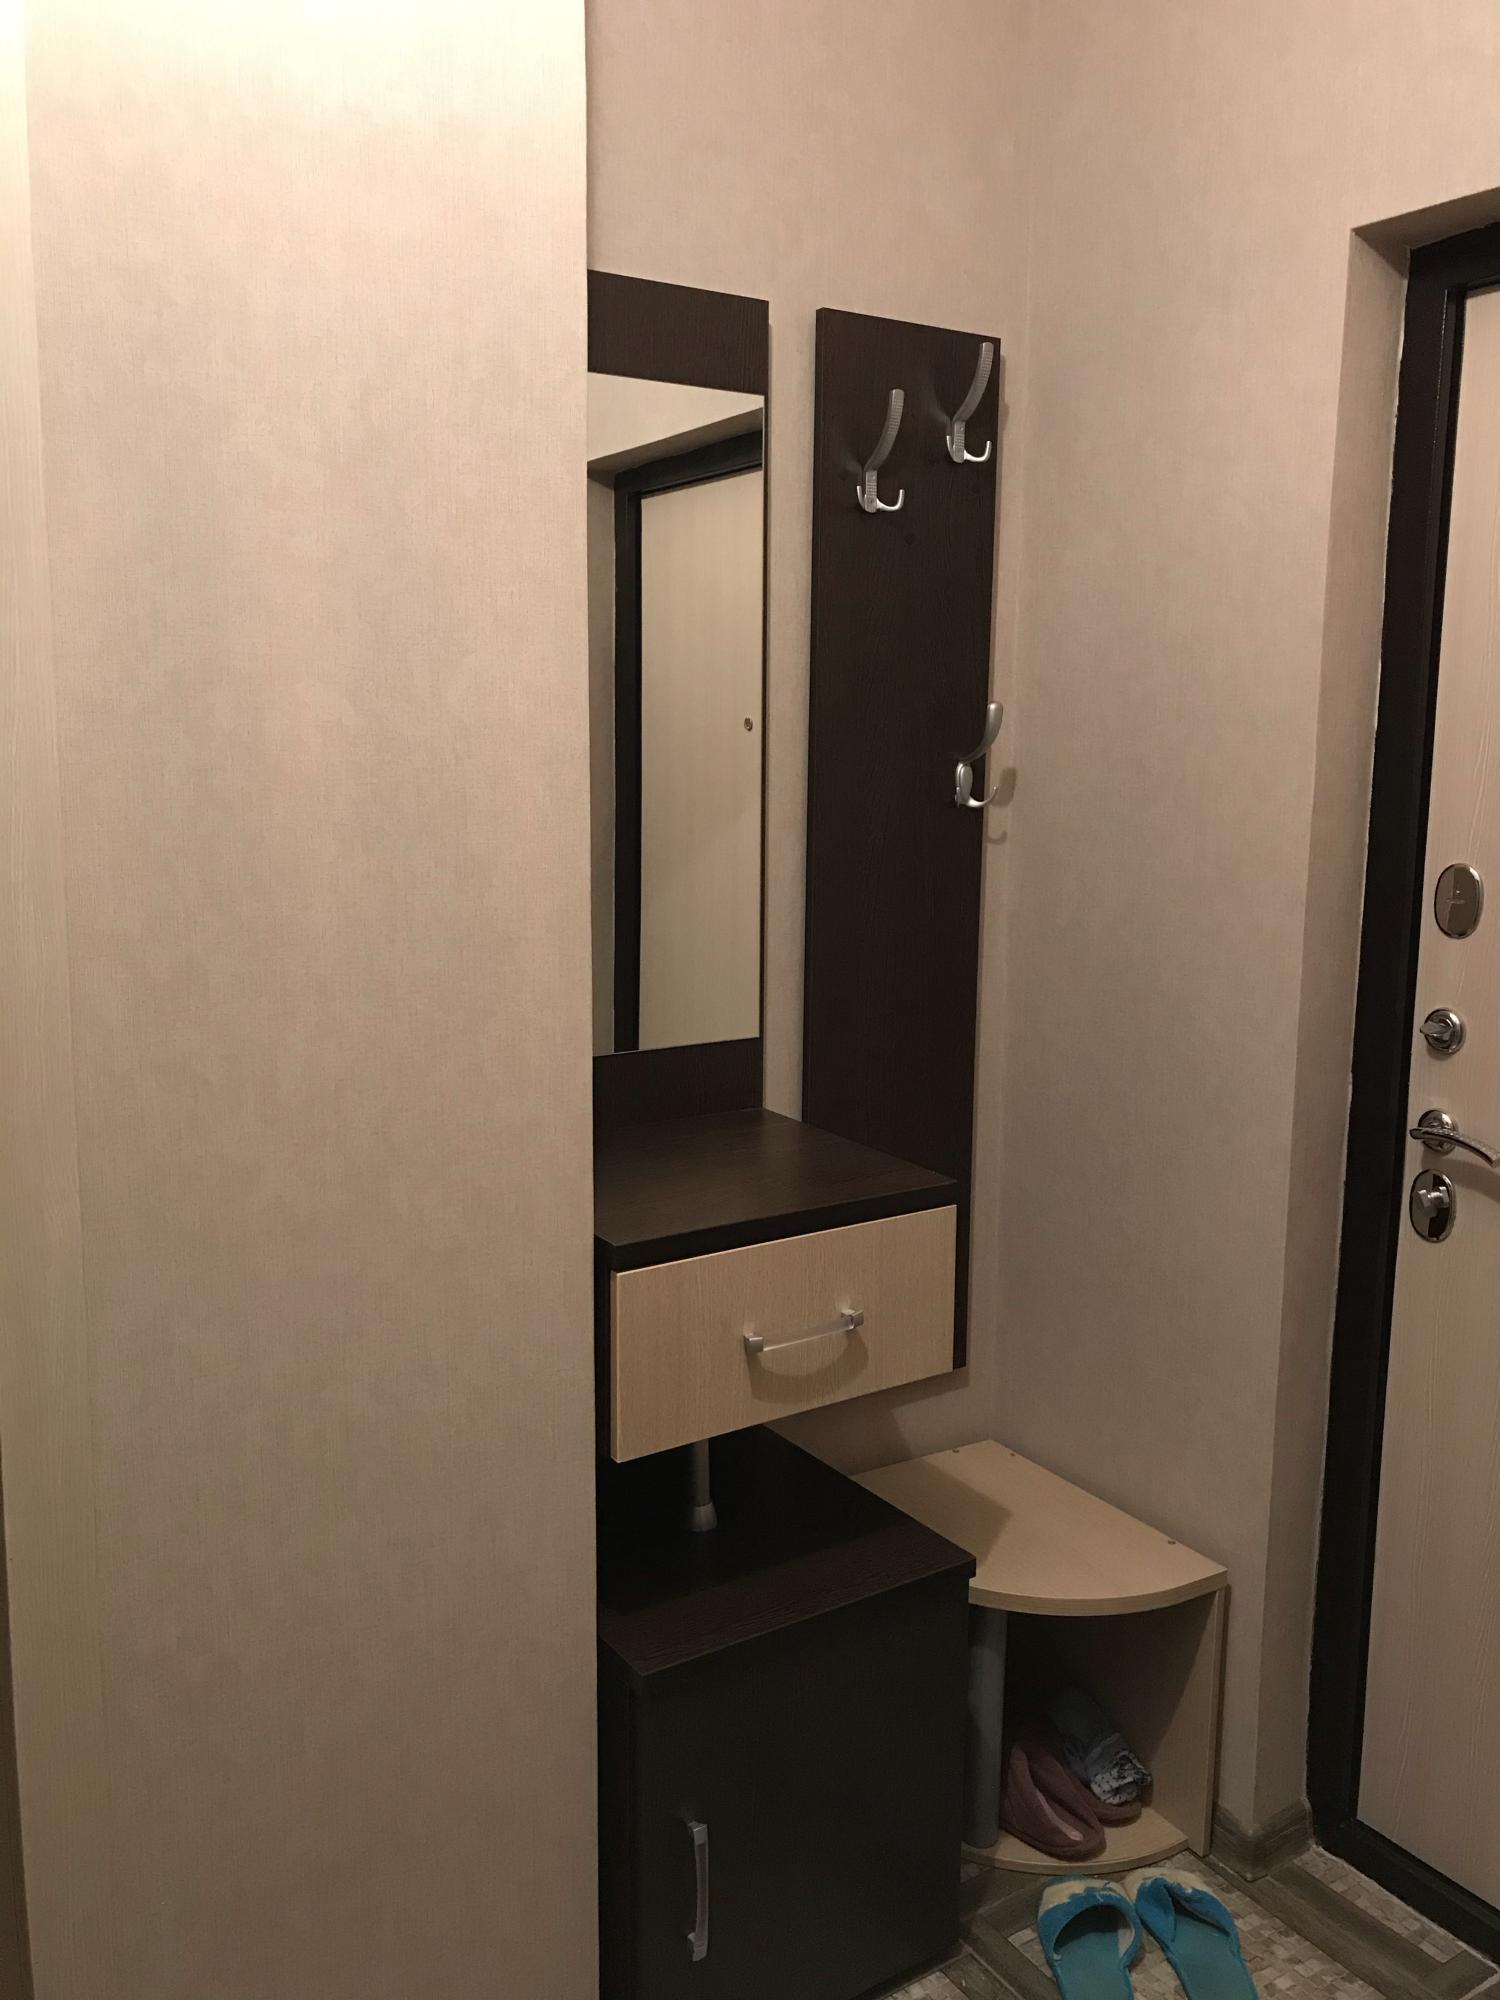 Квартира, 1 комната, 35 м² 89258601492 купить 5